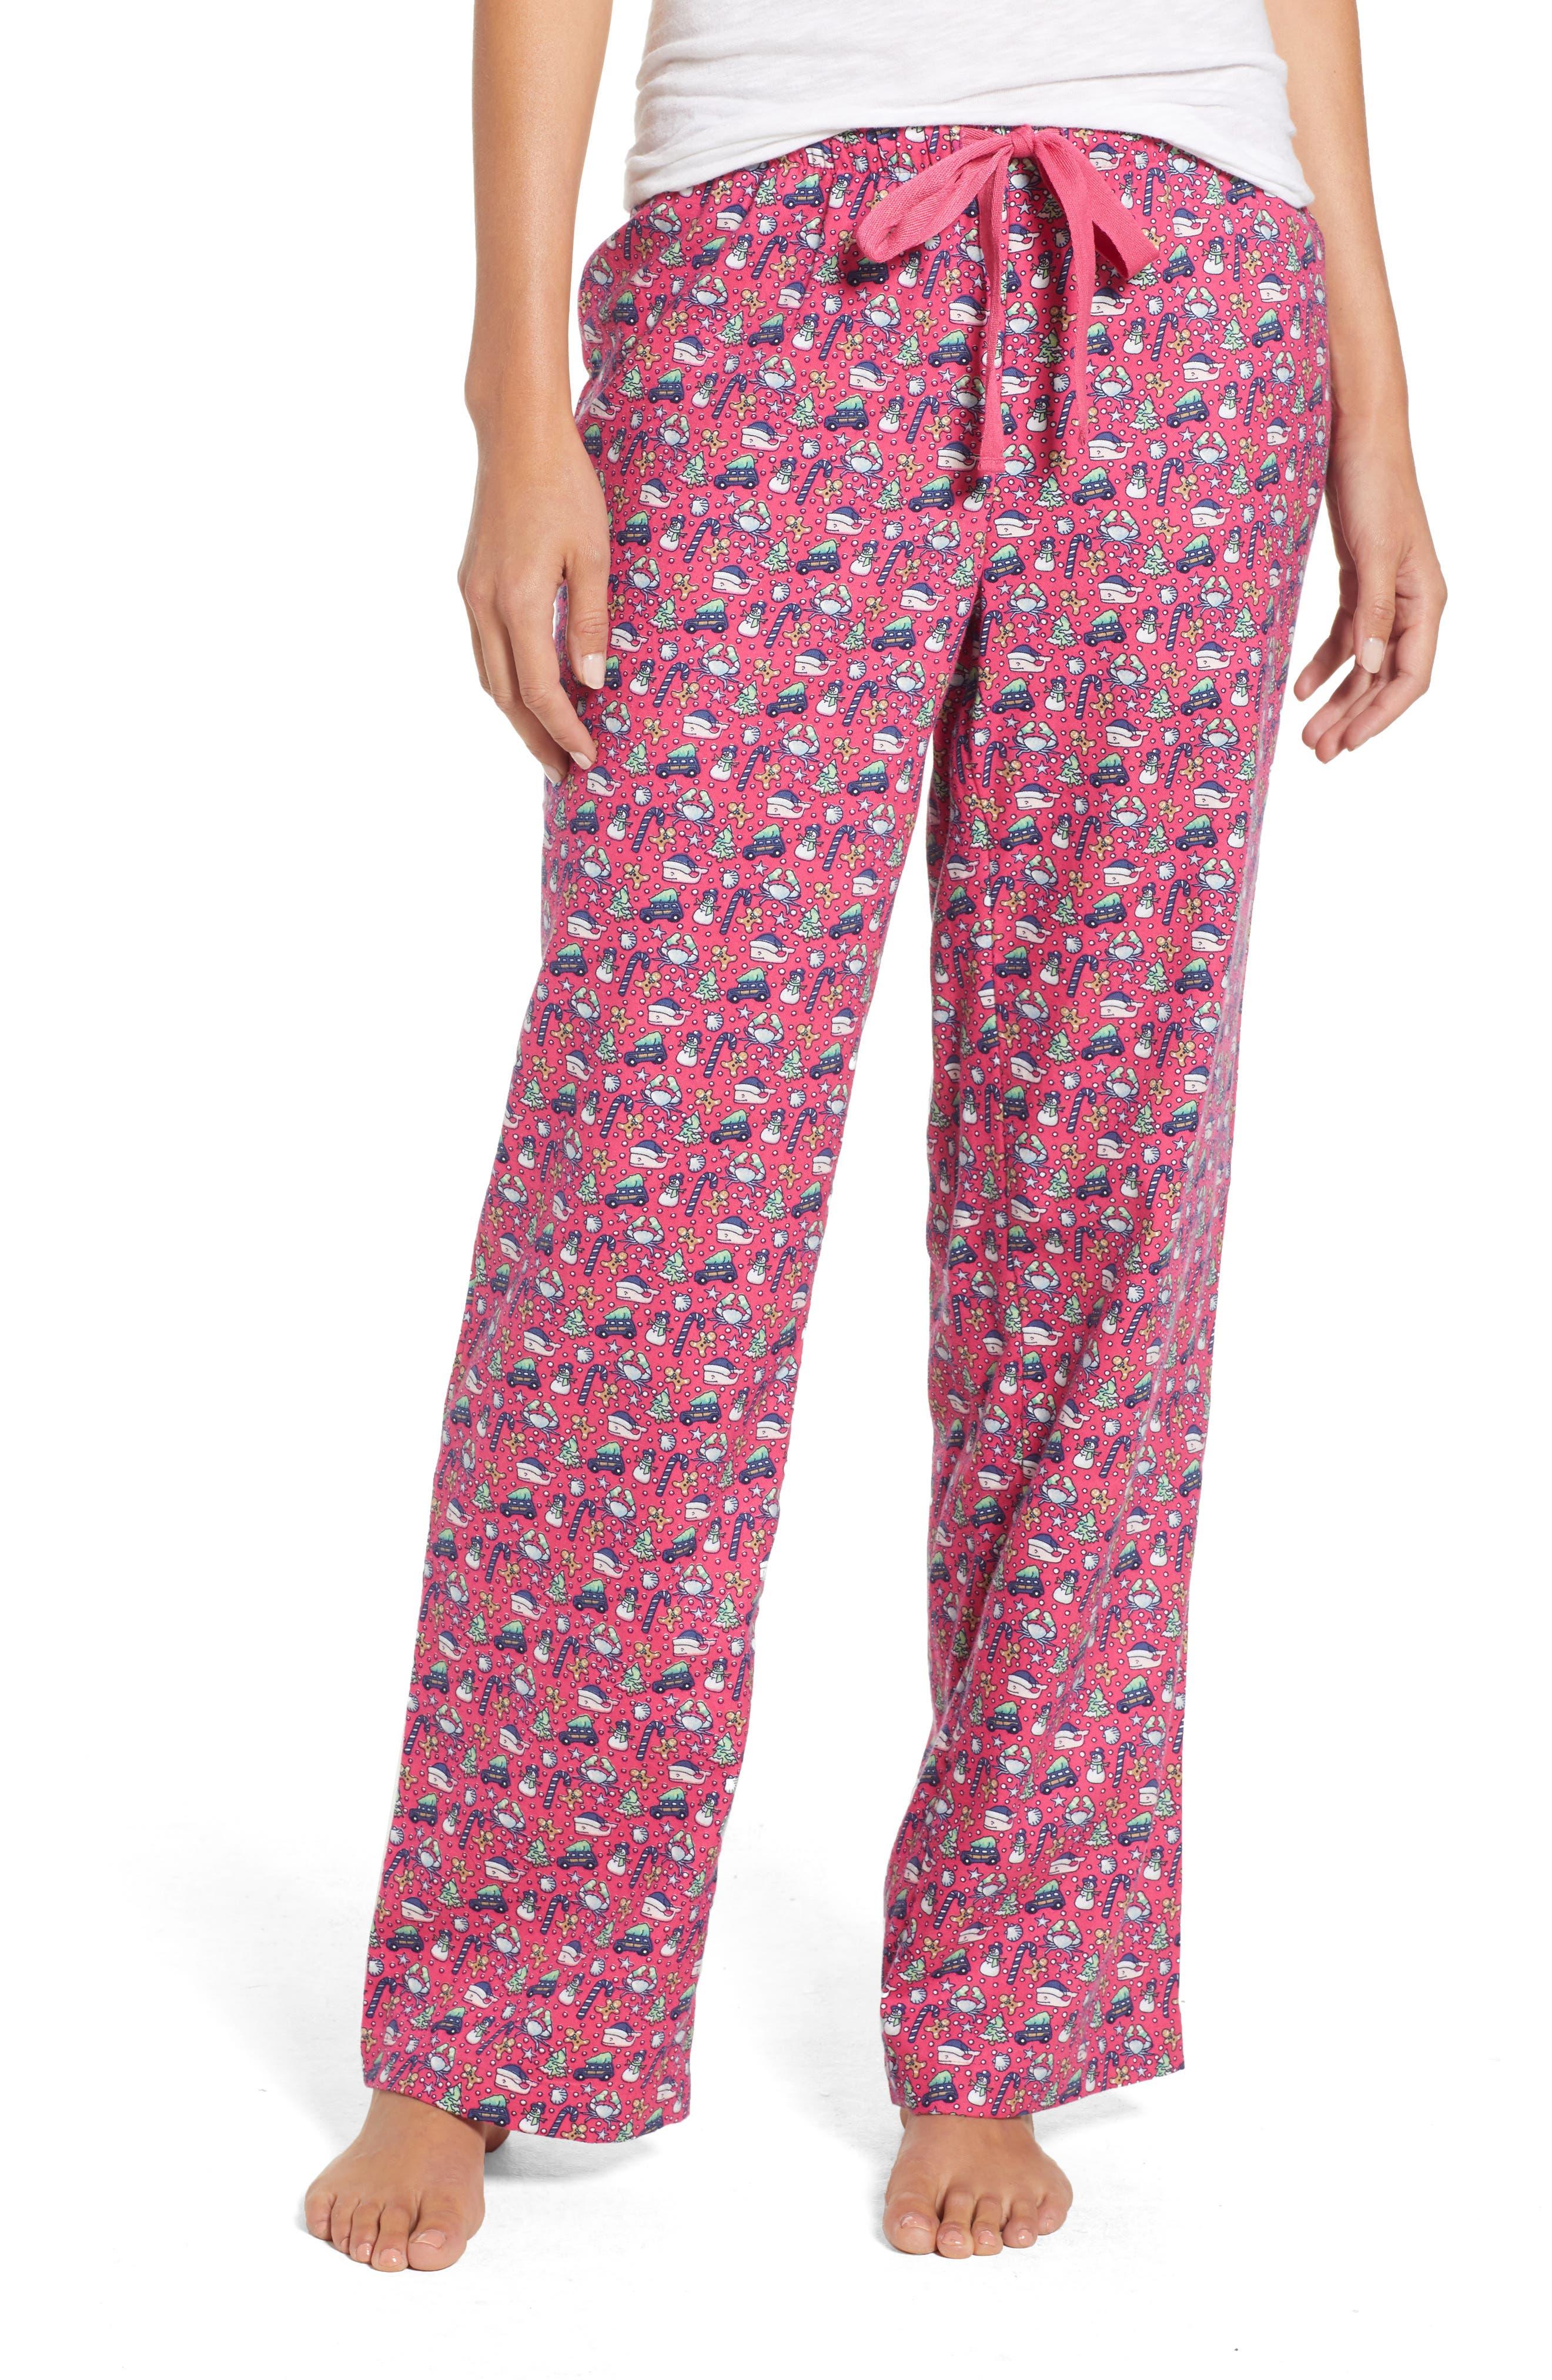 Holiday Print Lounge Pants,                             Main thumbnail 1, color,                             GOJI BERRY